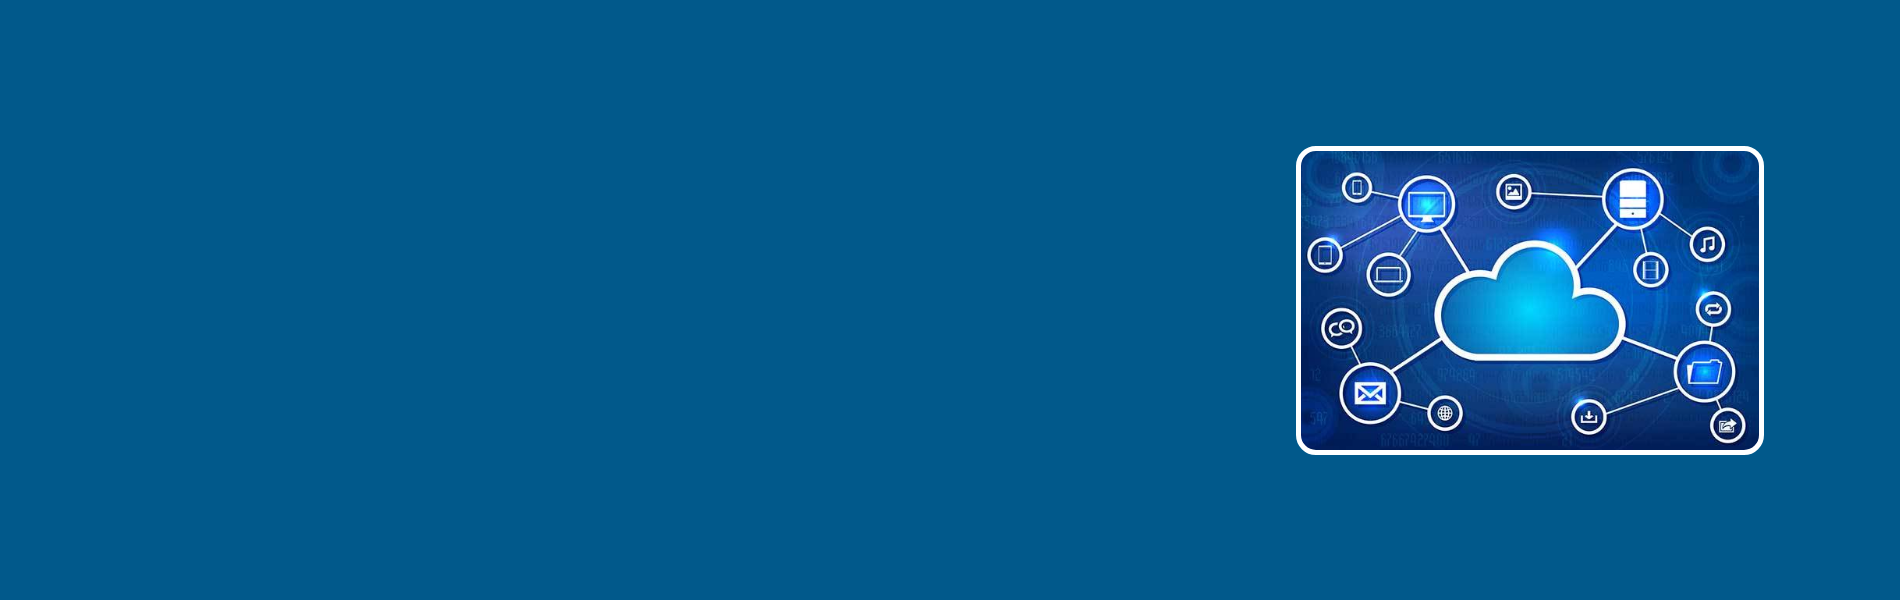 cloud_computing_1900x600 – 18